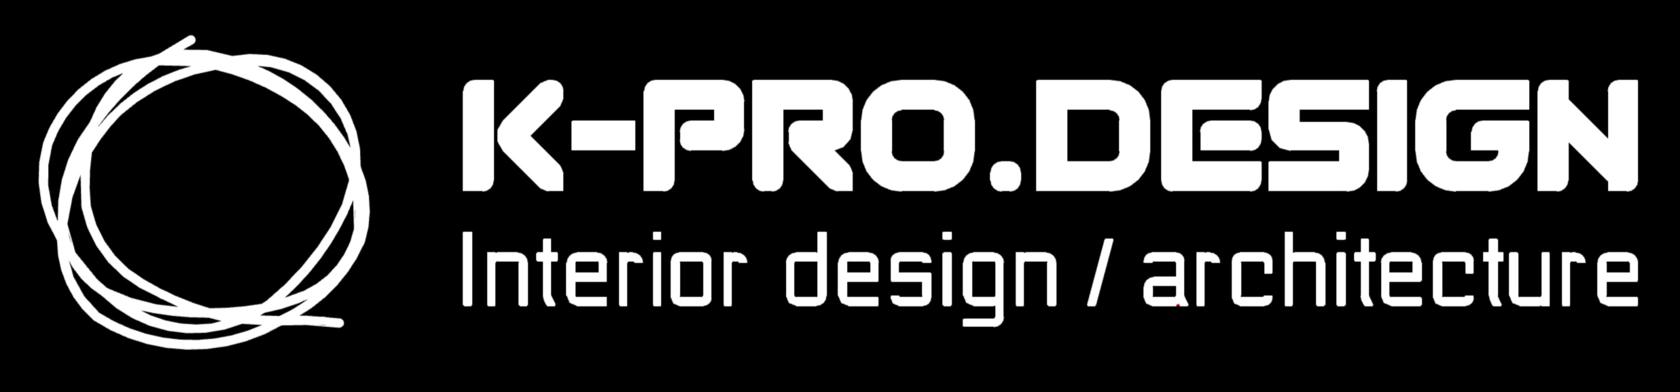 K-pro.design